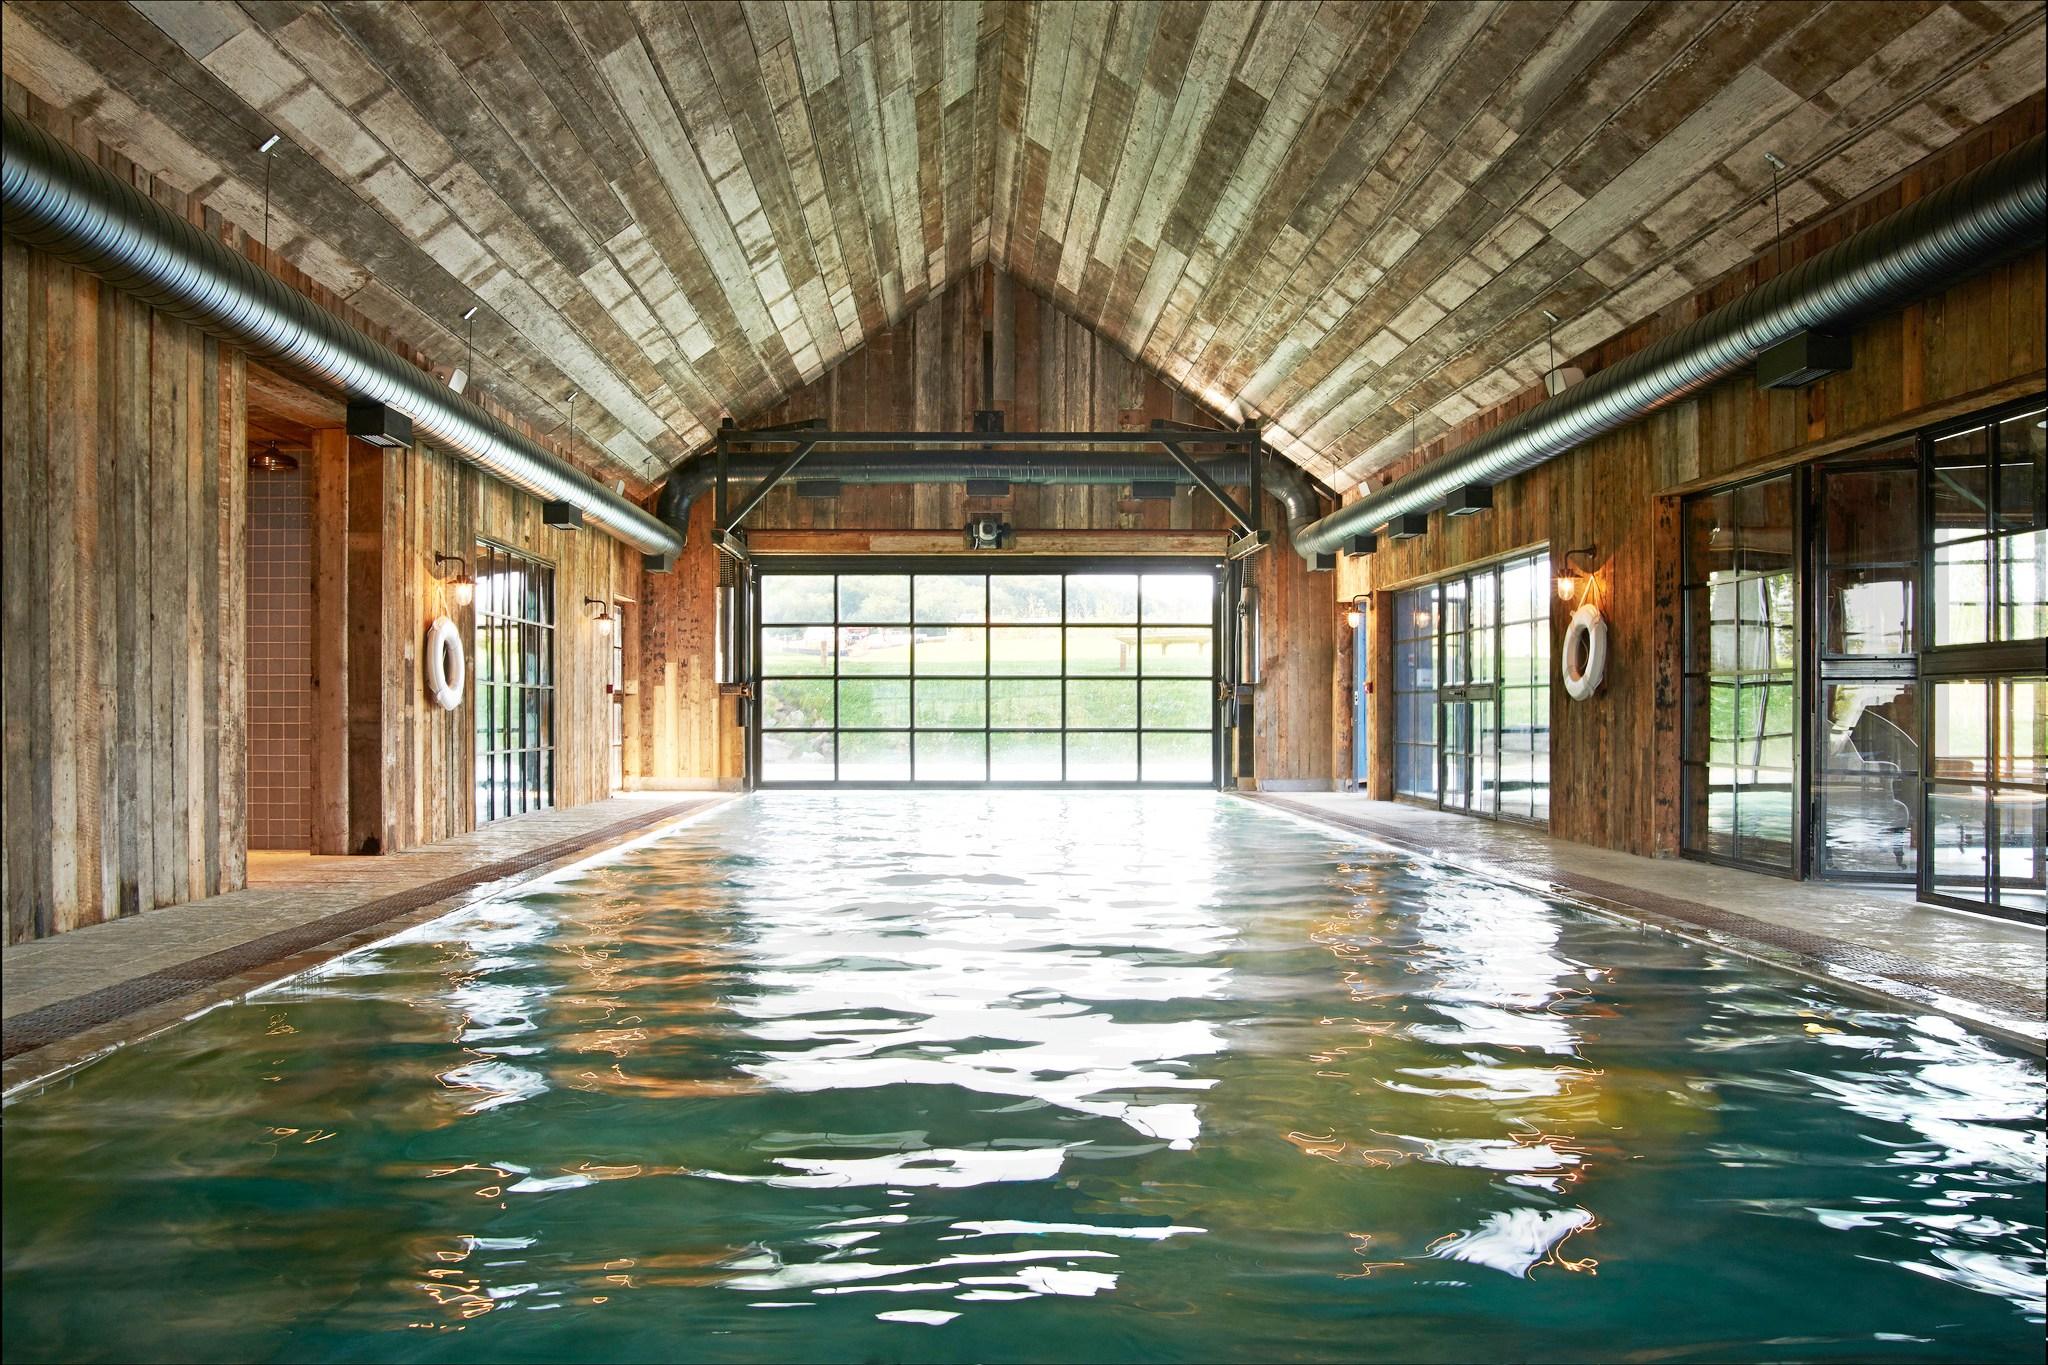 soho-house-farmhouse-2016-boyd-hotel-oxfordshire-4